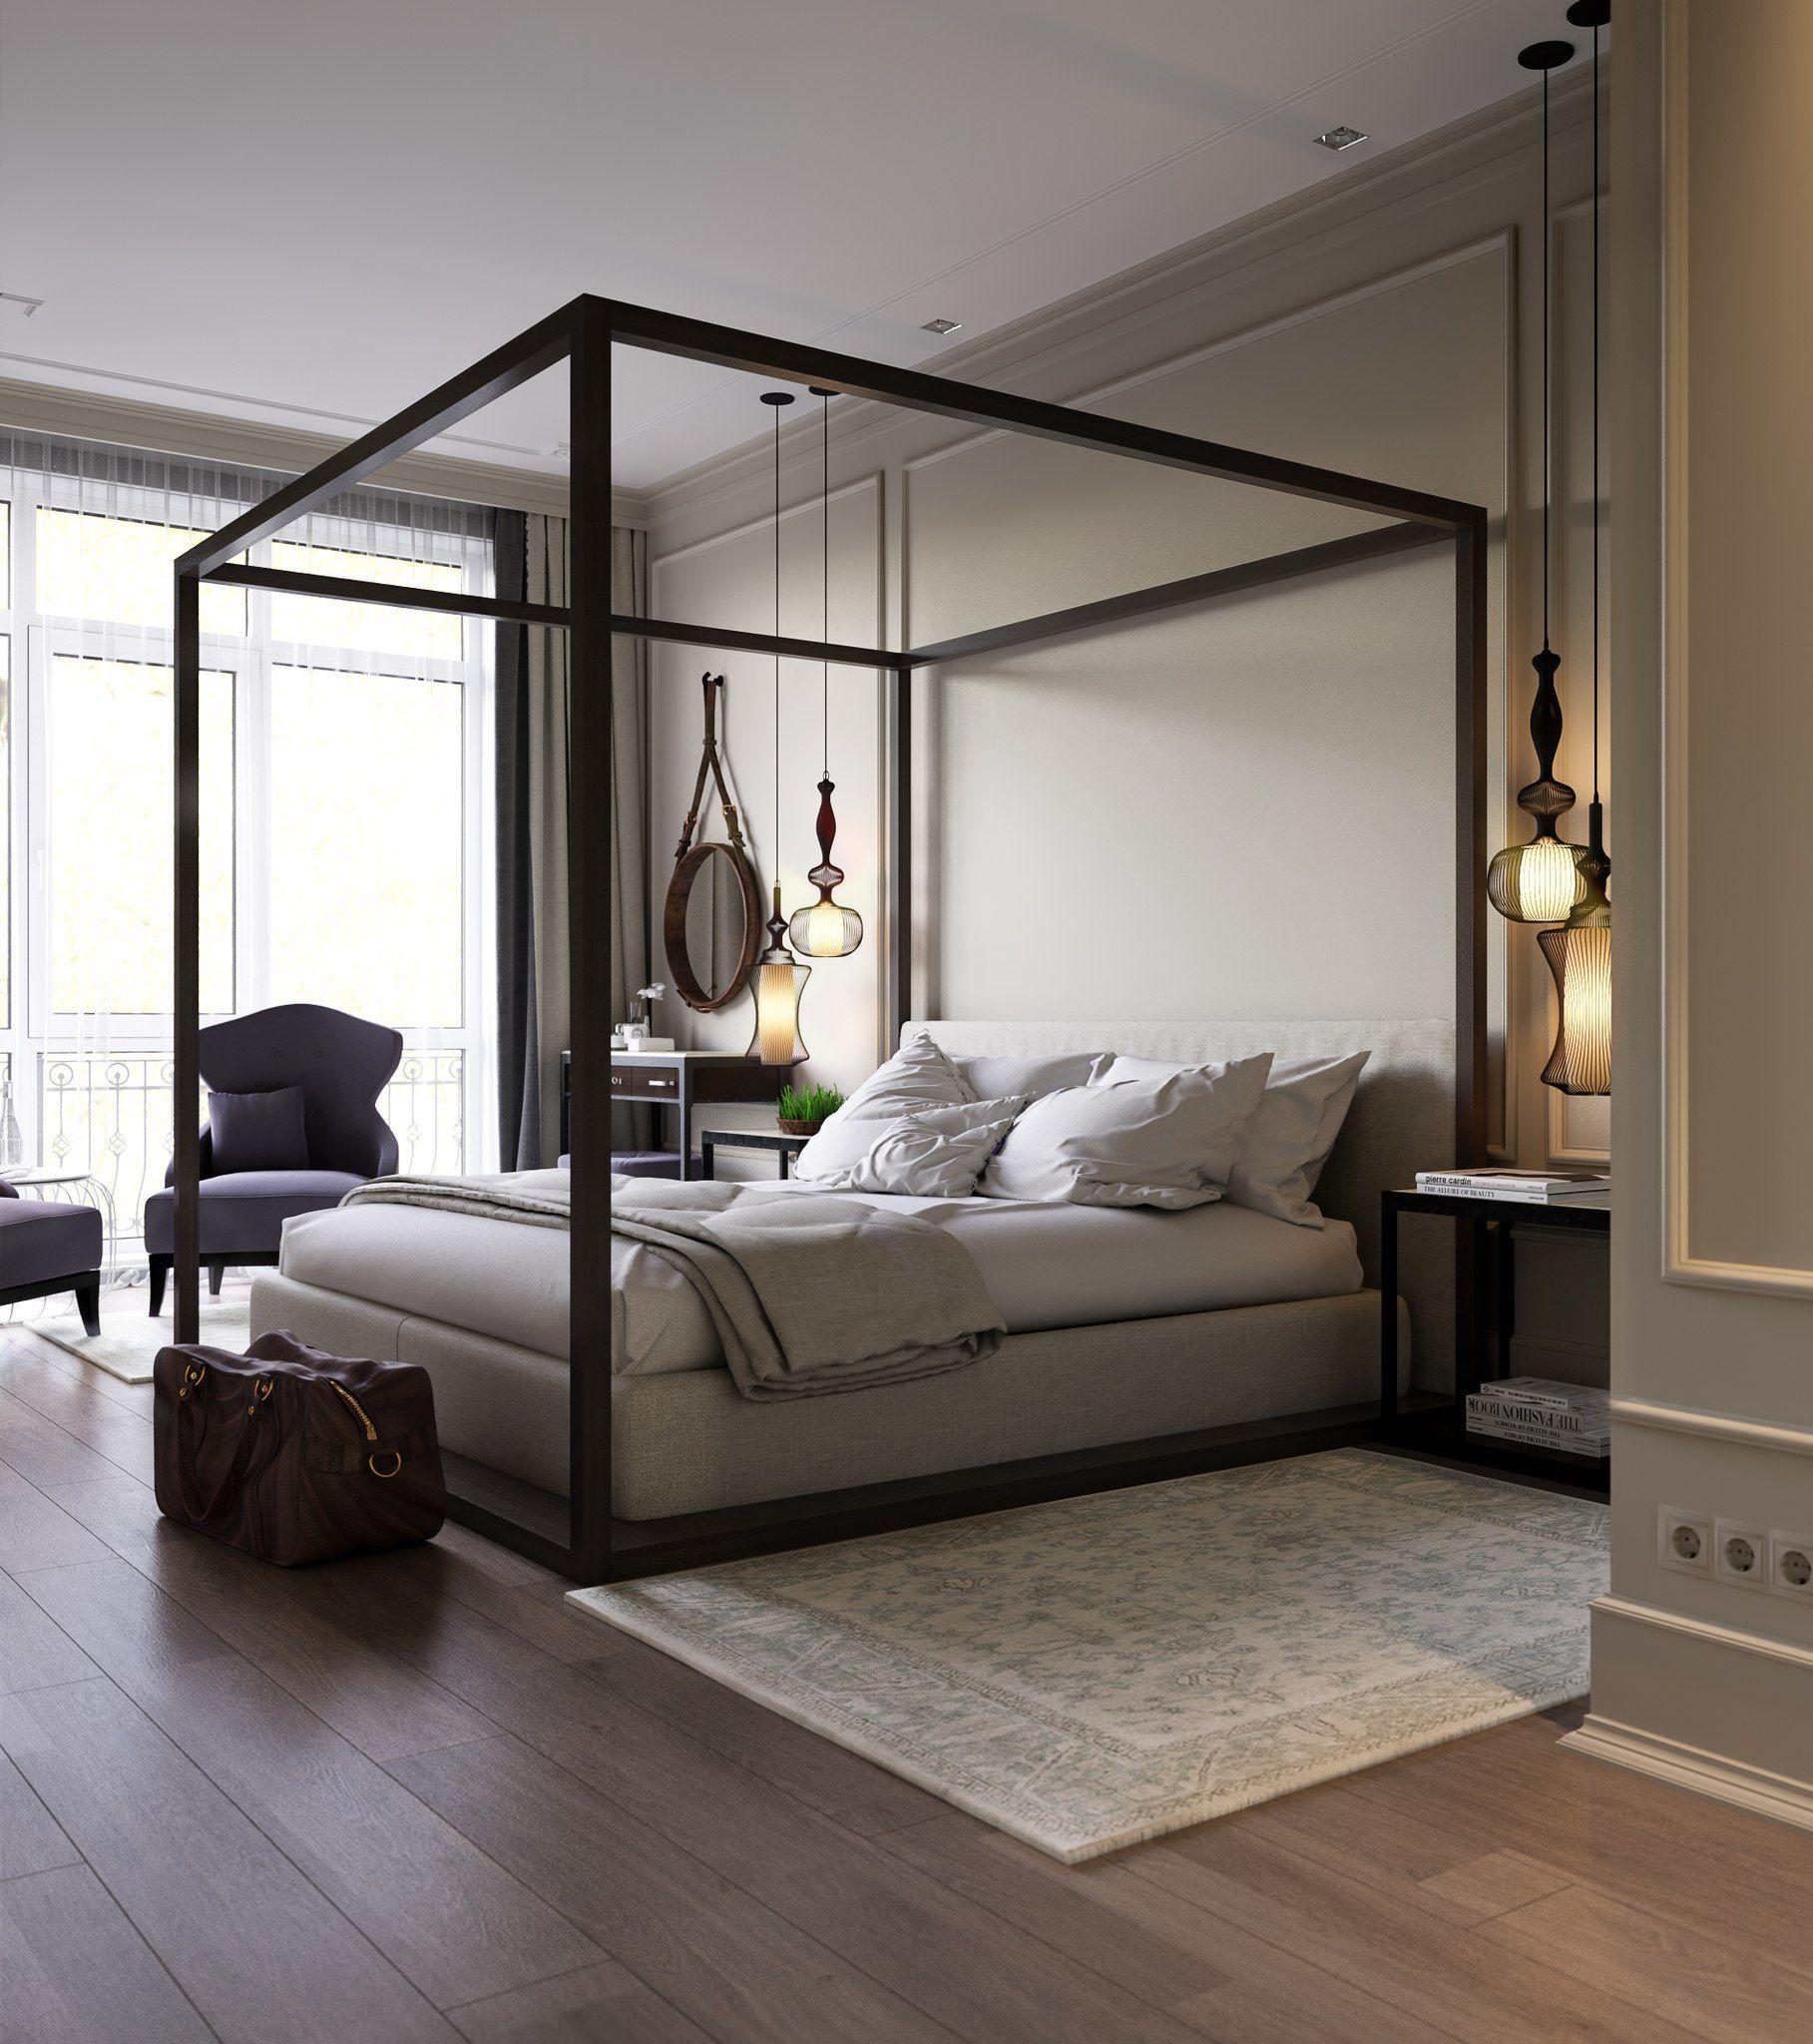 JZGtILll0Zo.jpg (1817×2048) | 臥室 | Pinterest | Schlafzimmer